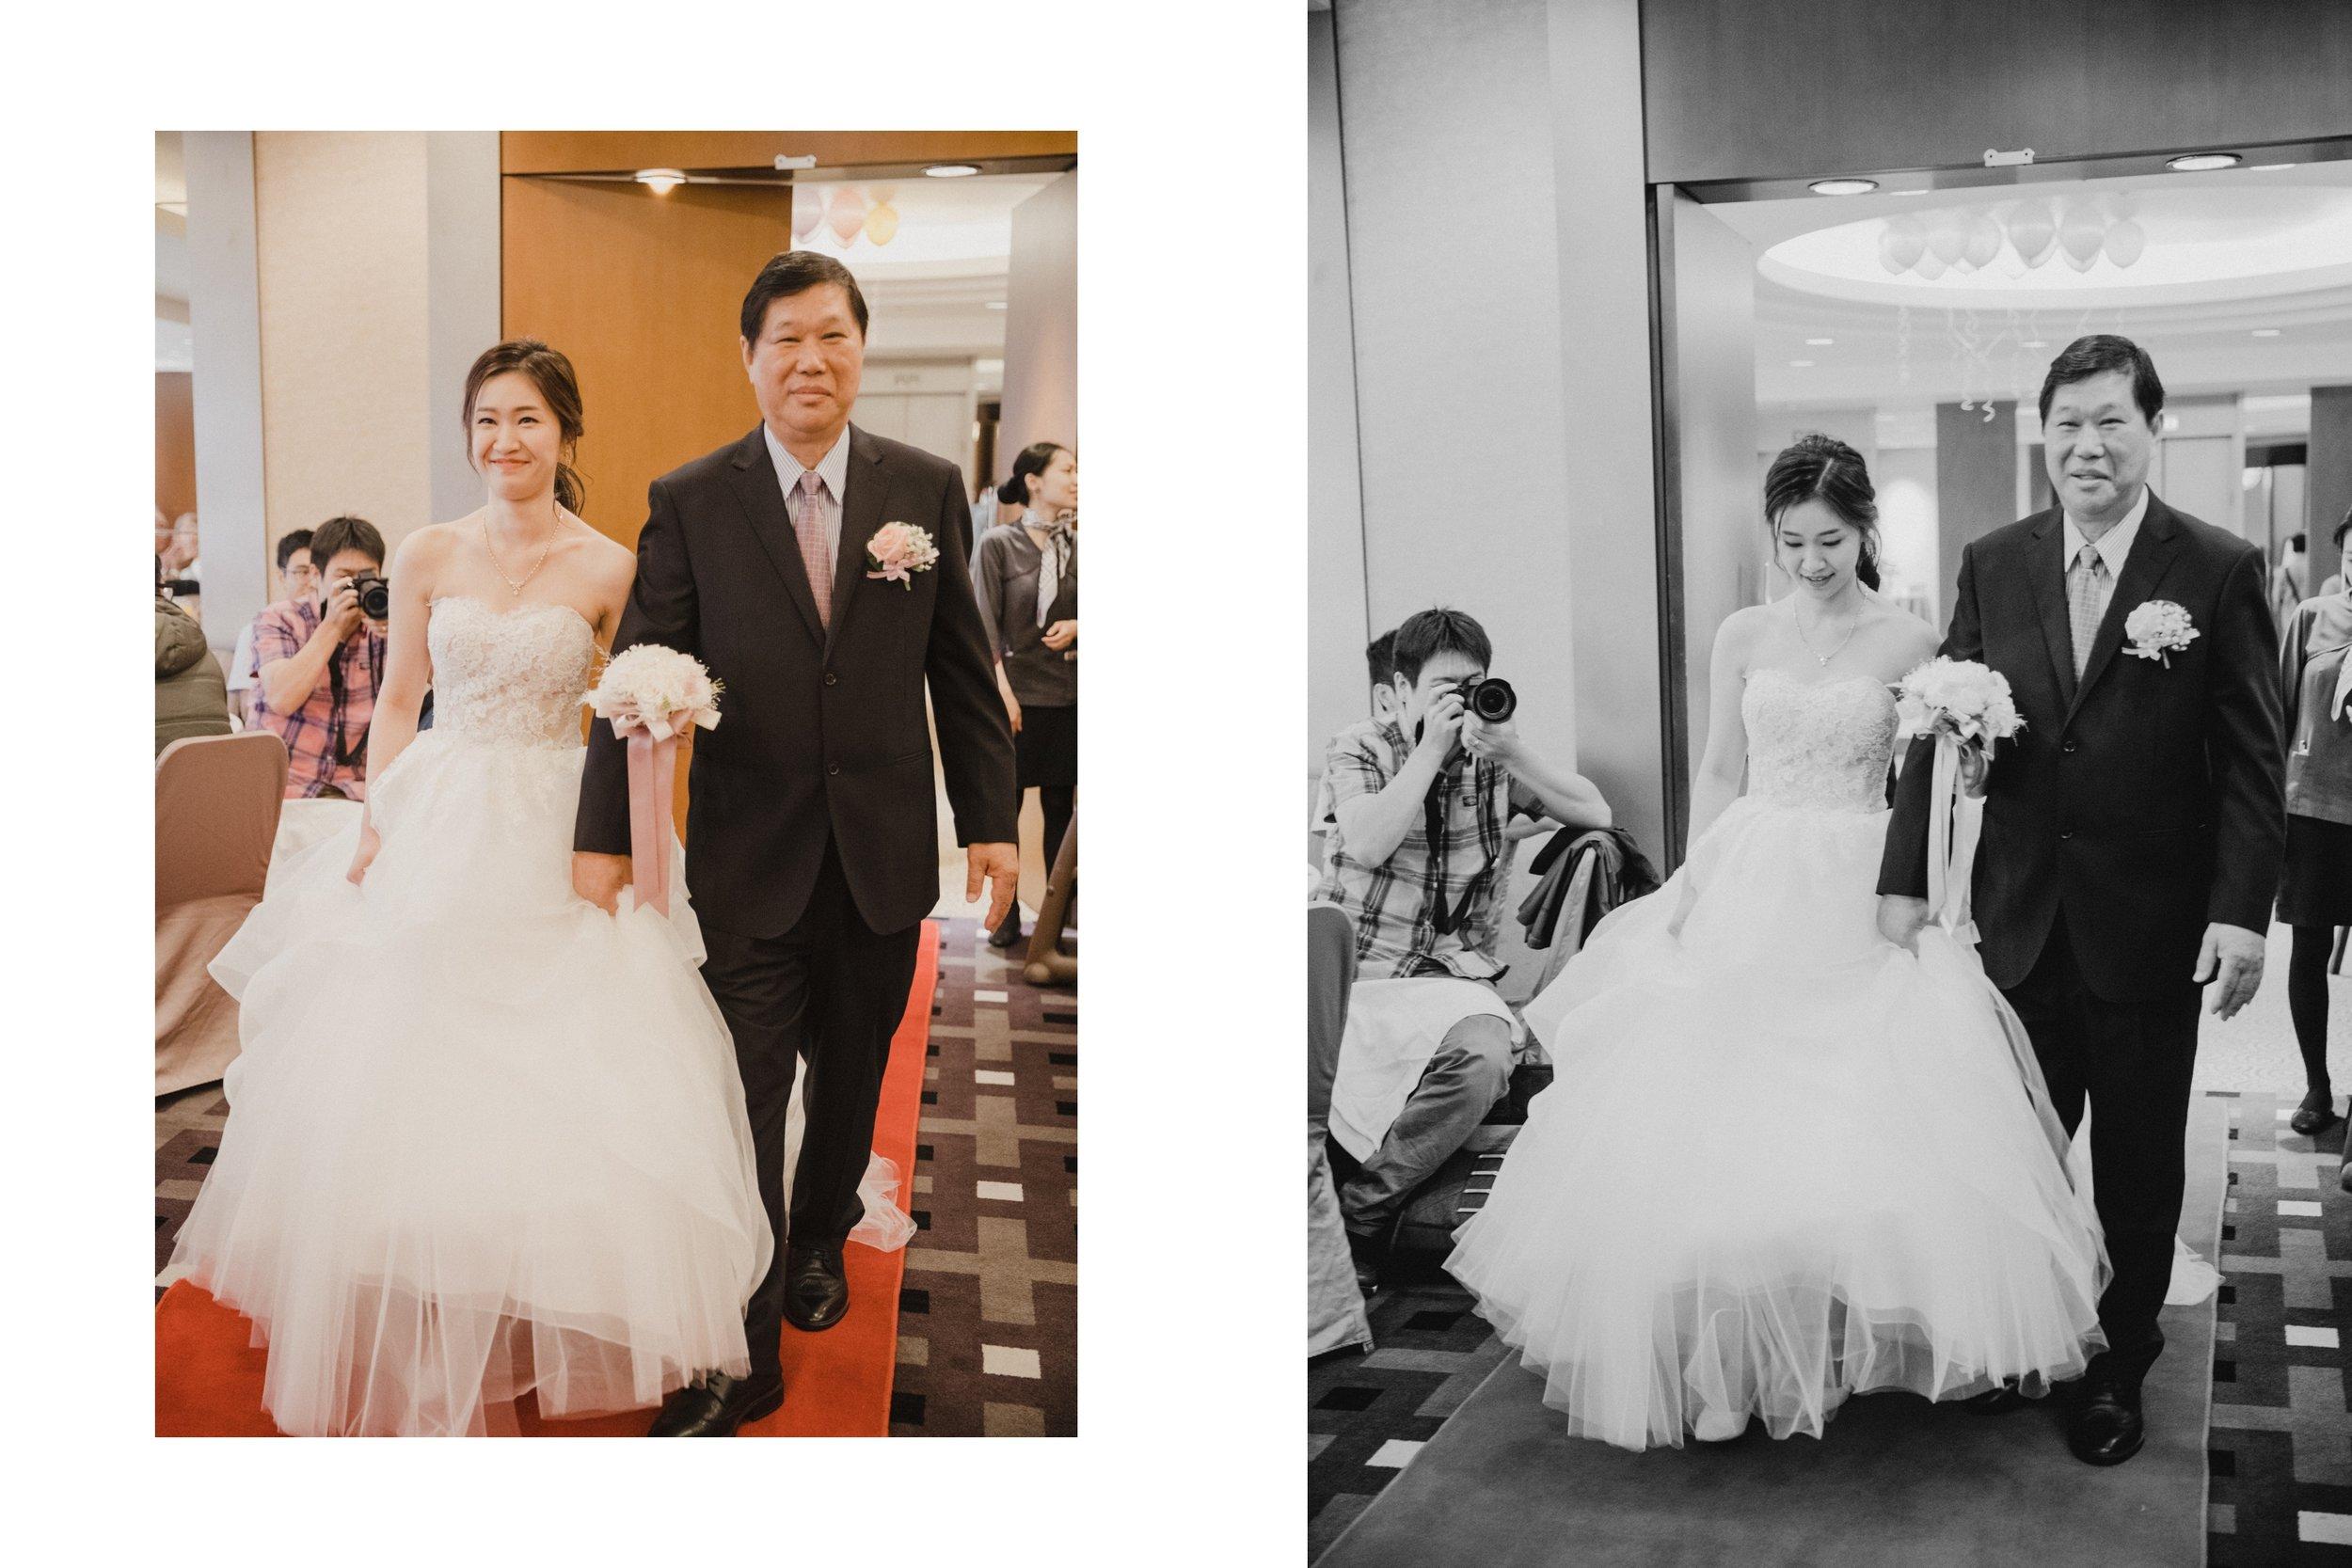 wedding-caridee-oscar-lunch-ambassador-hsinchu-結婚午宴-新竹國賓_62.jpg